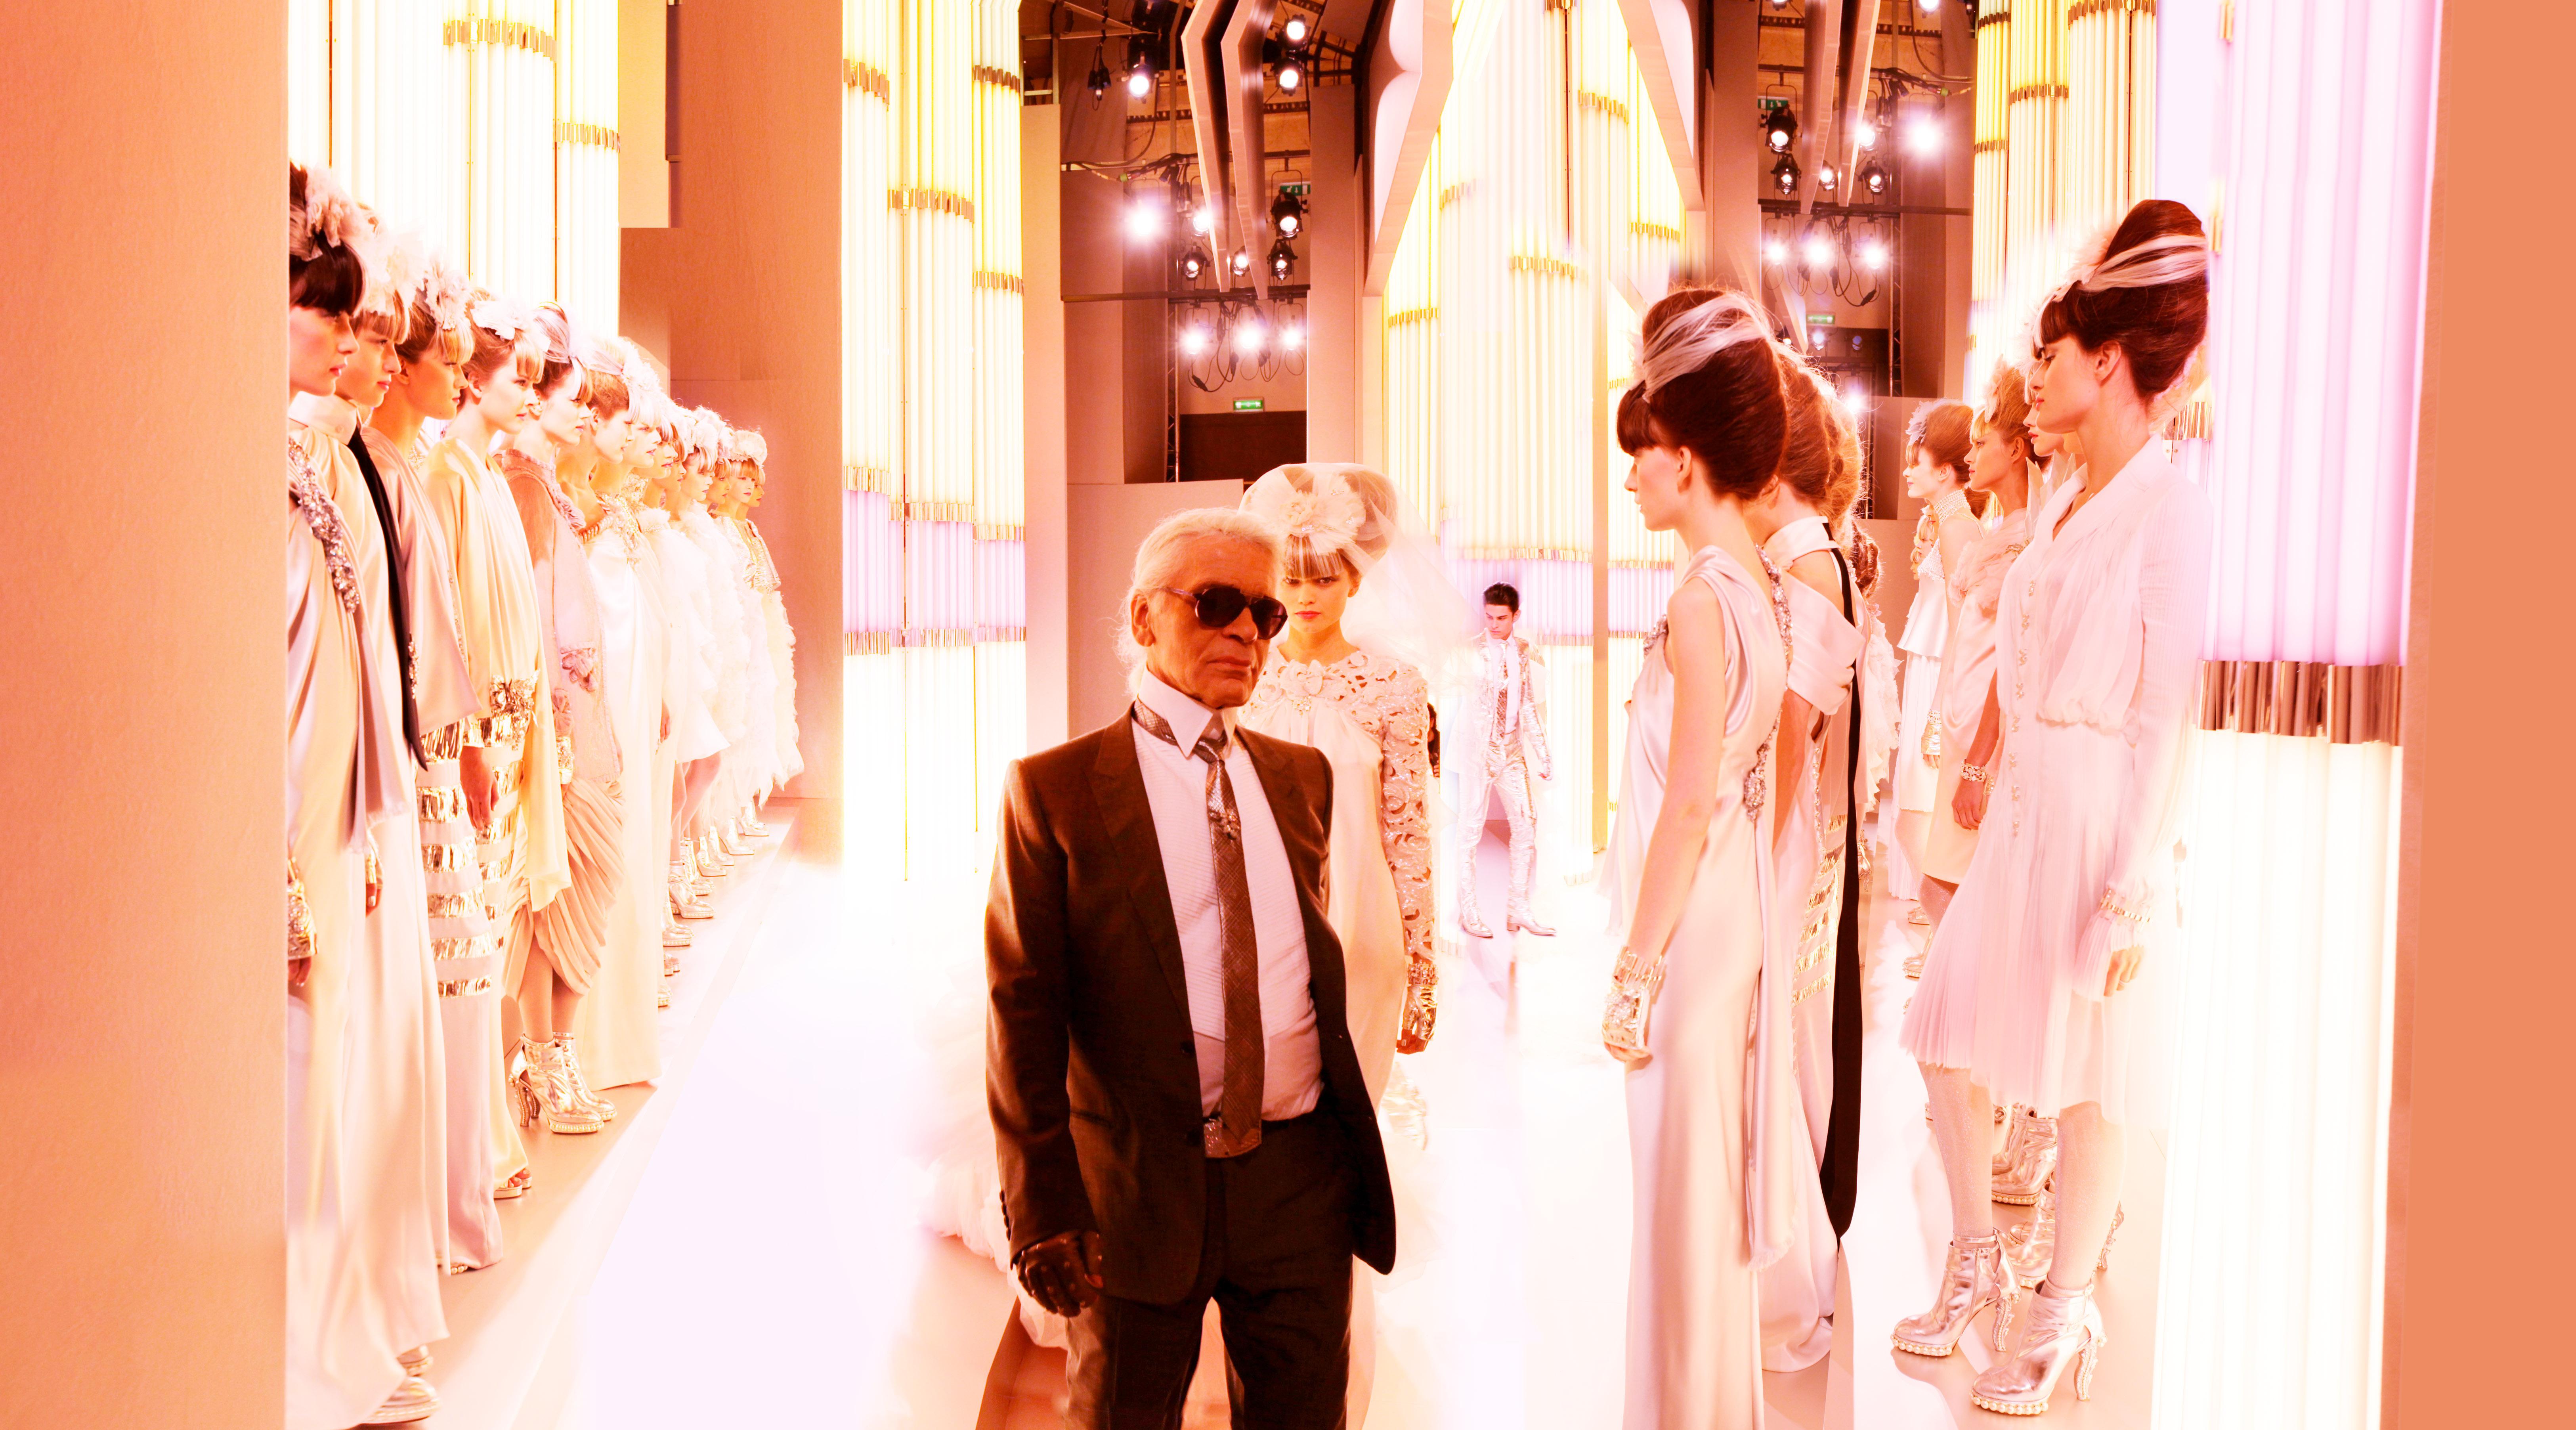 Karl Lagerfeld's Chanel runway shows